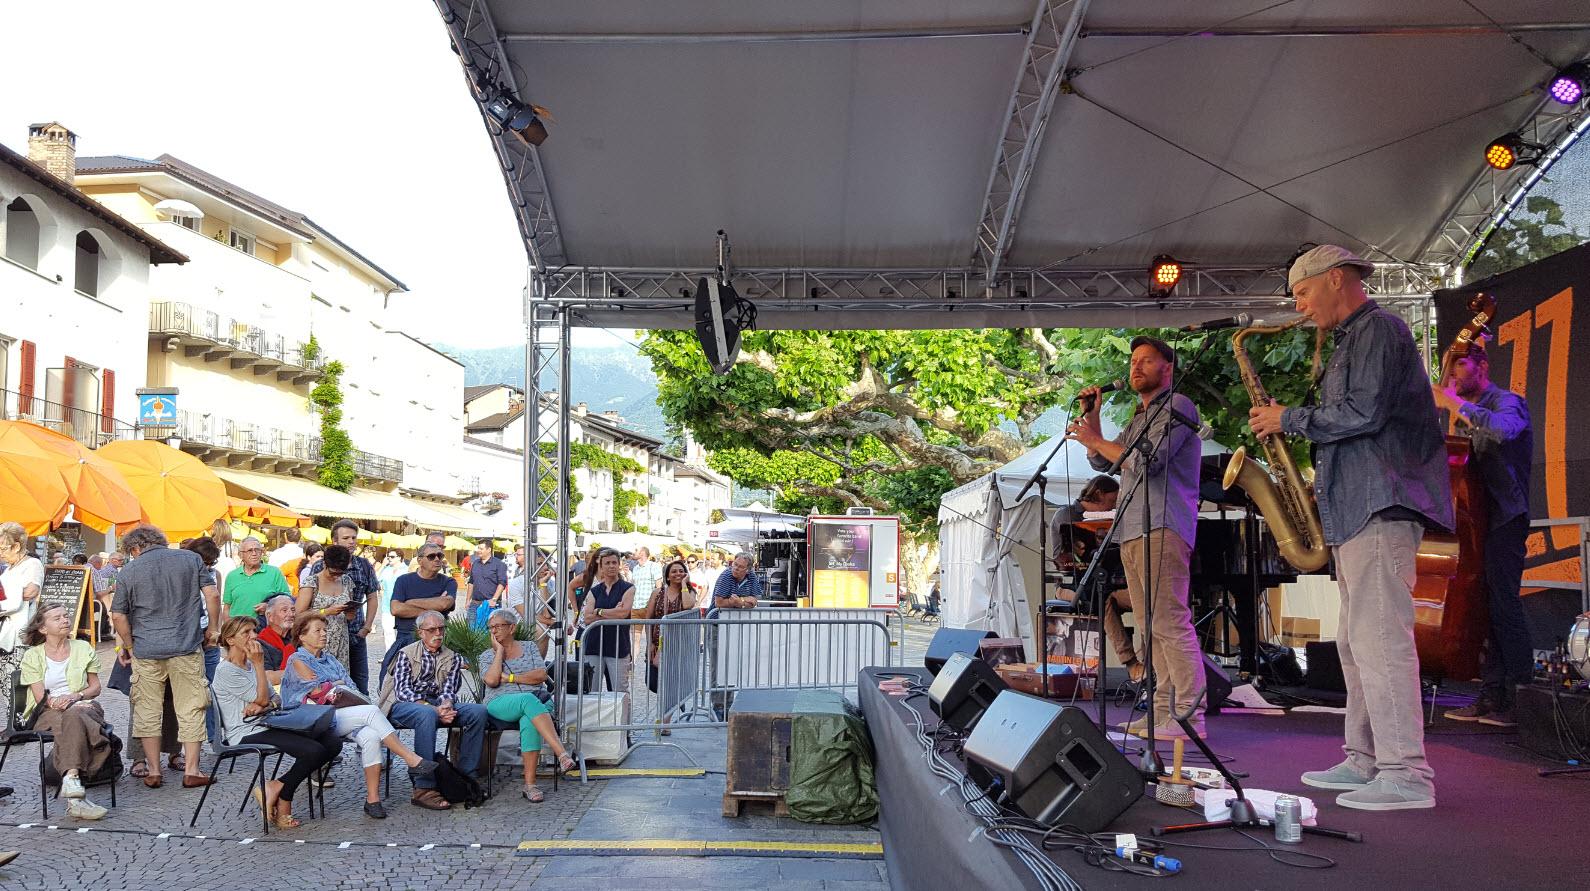 Festival de jazz en Suisse